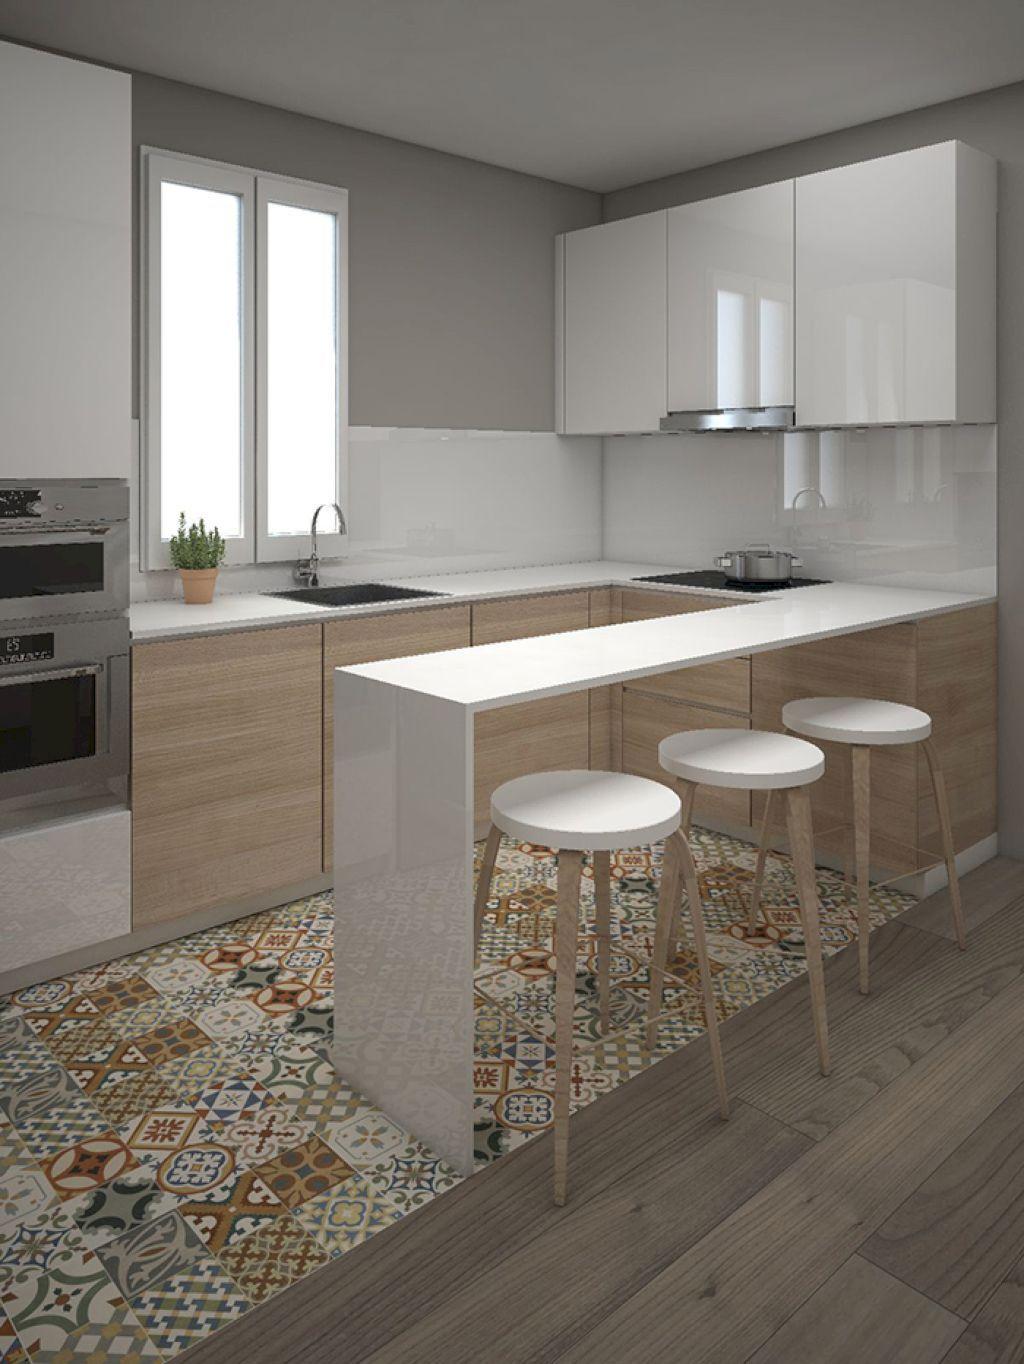 45 Modern Contemporary Kitchen Ideas | Cocinas, Casas y Cocina pequeña